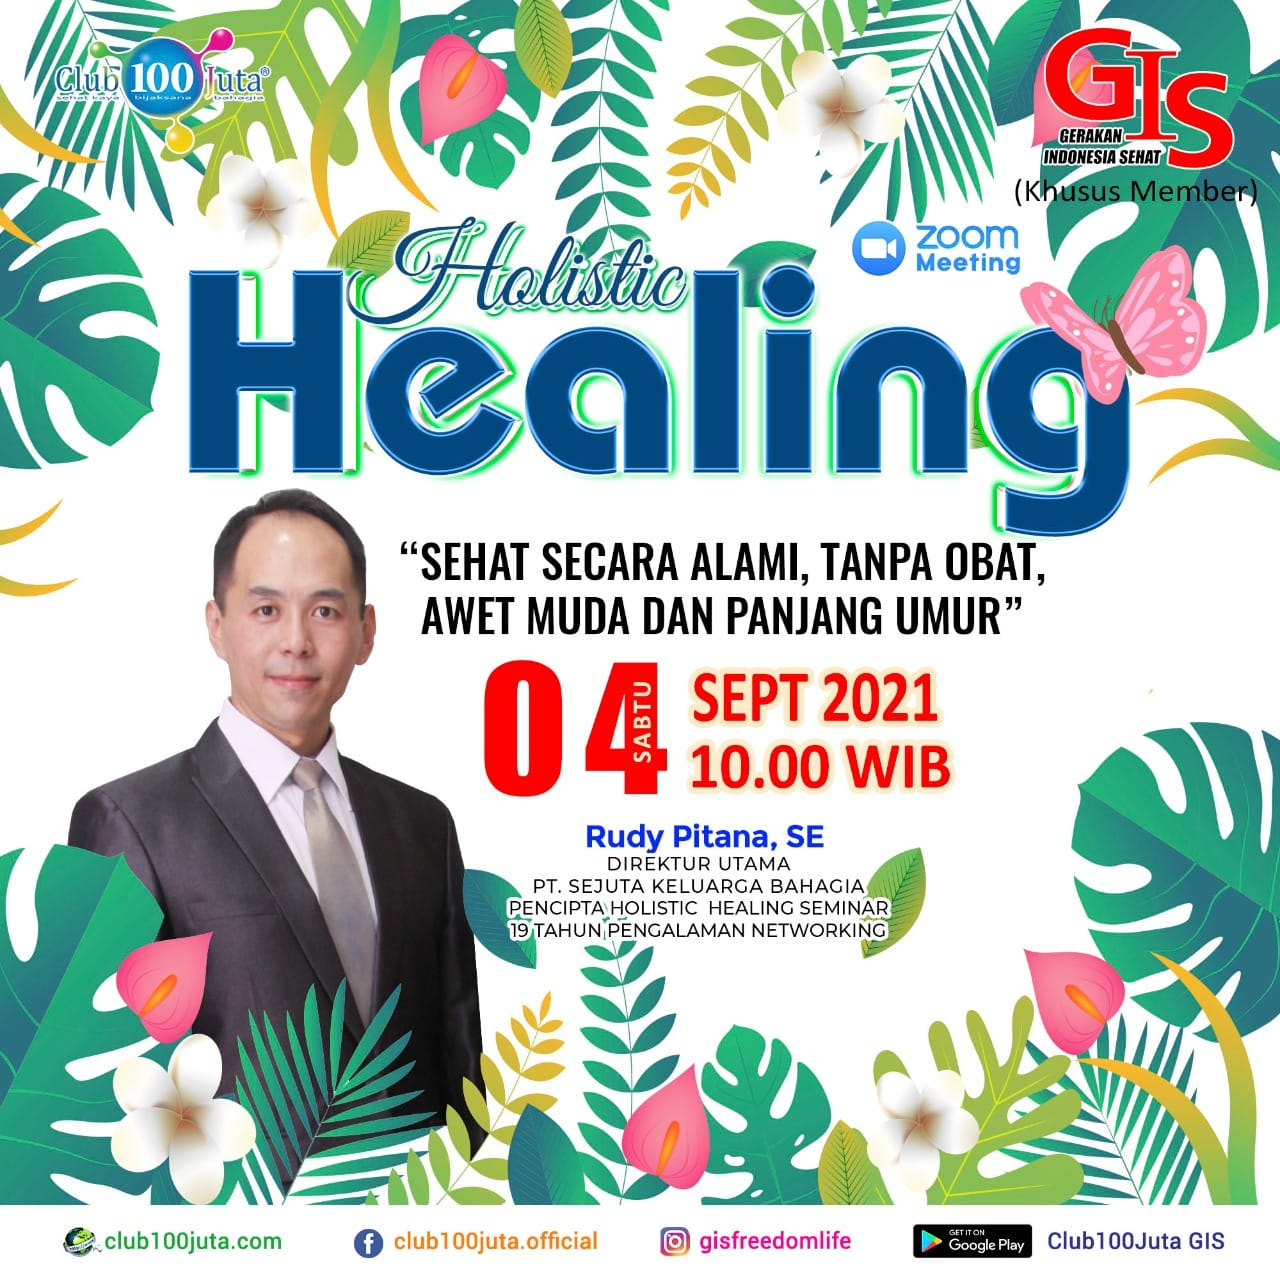 Holistic Healing - Minggu pertama Sept 2021